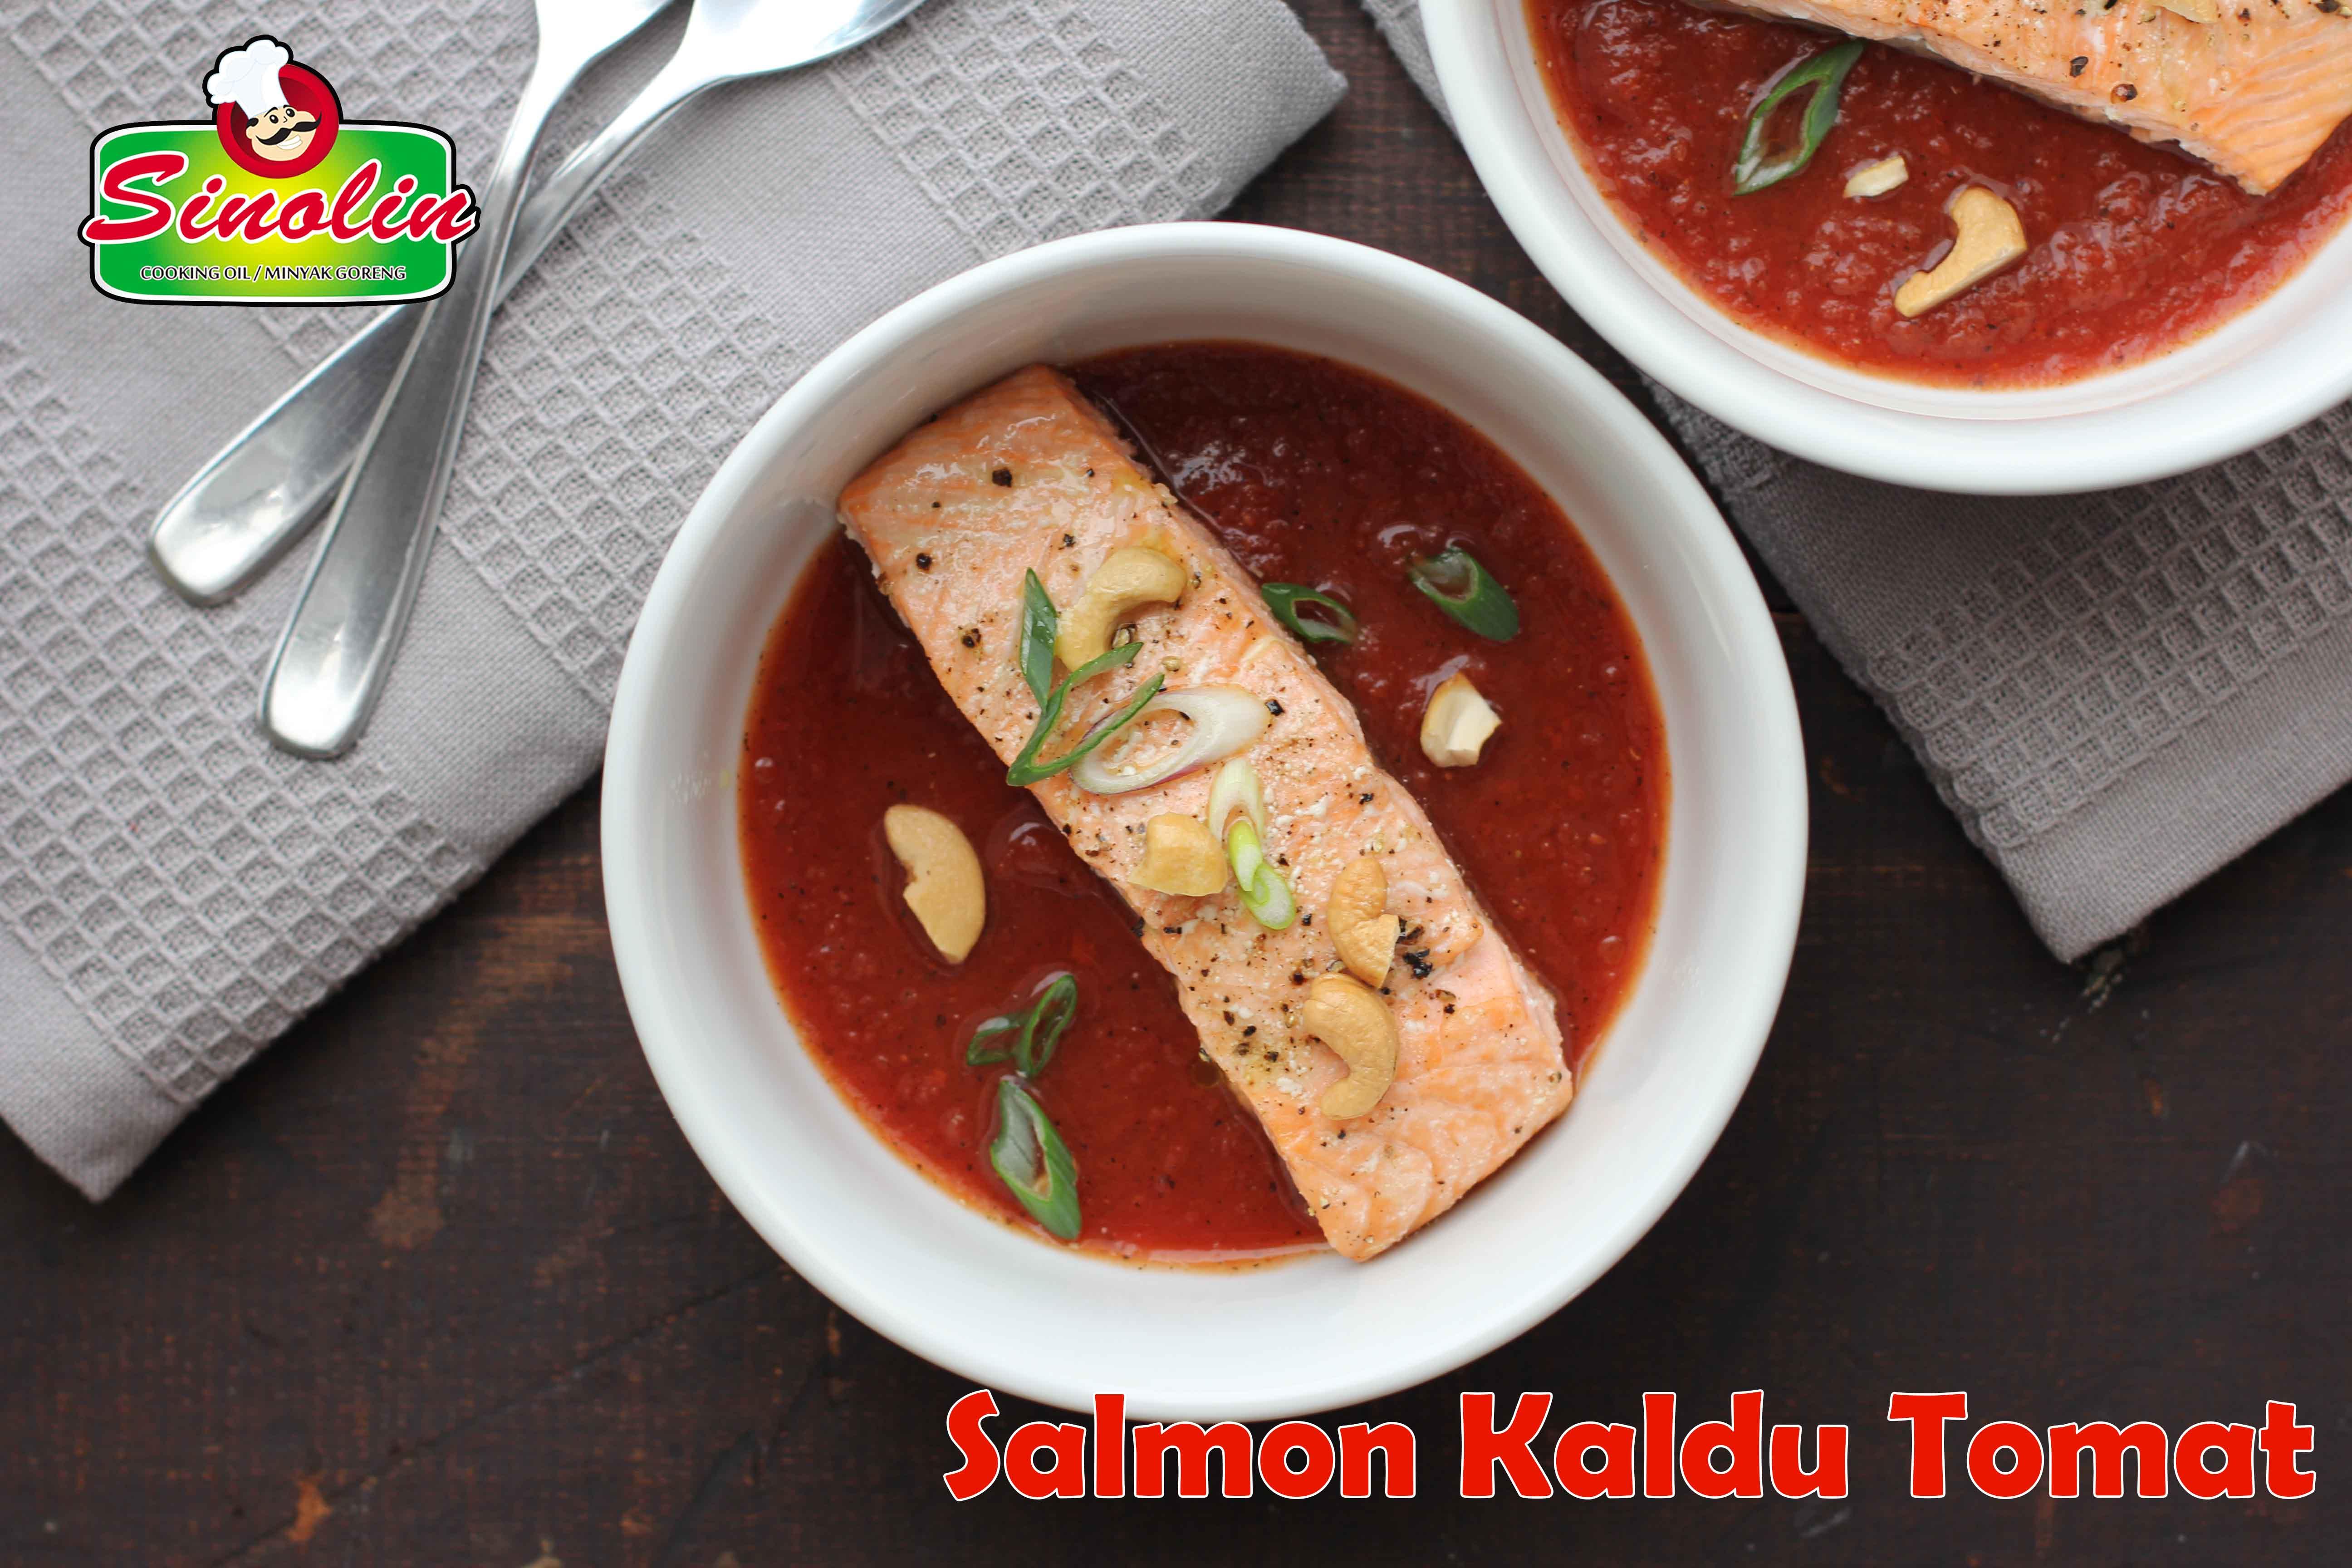 Salmon Kaldu Tomat